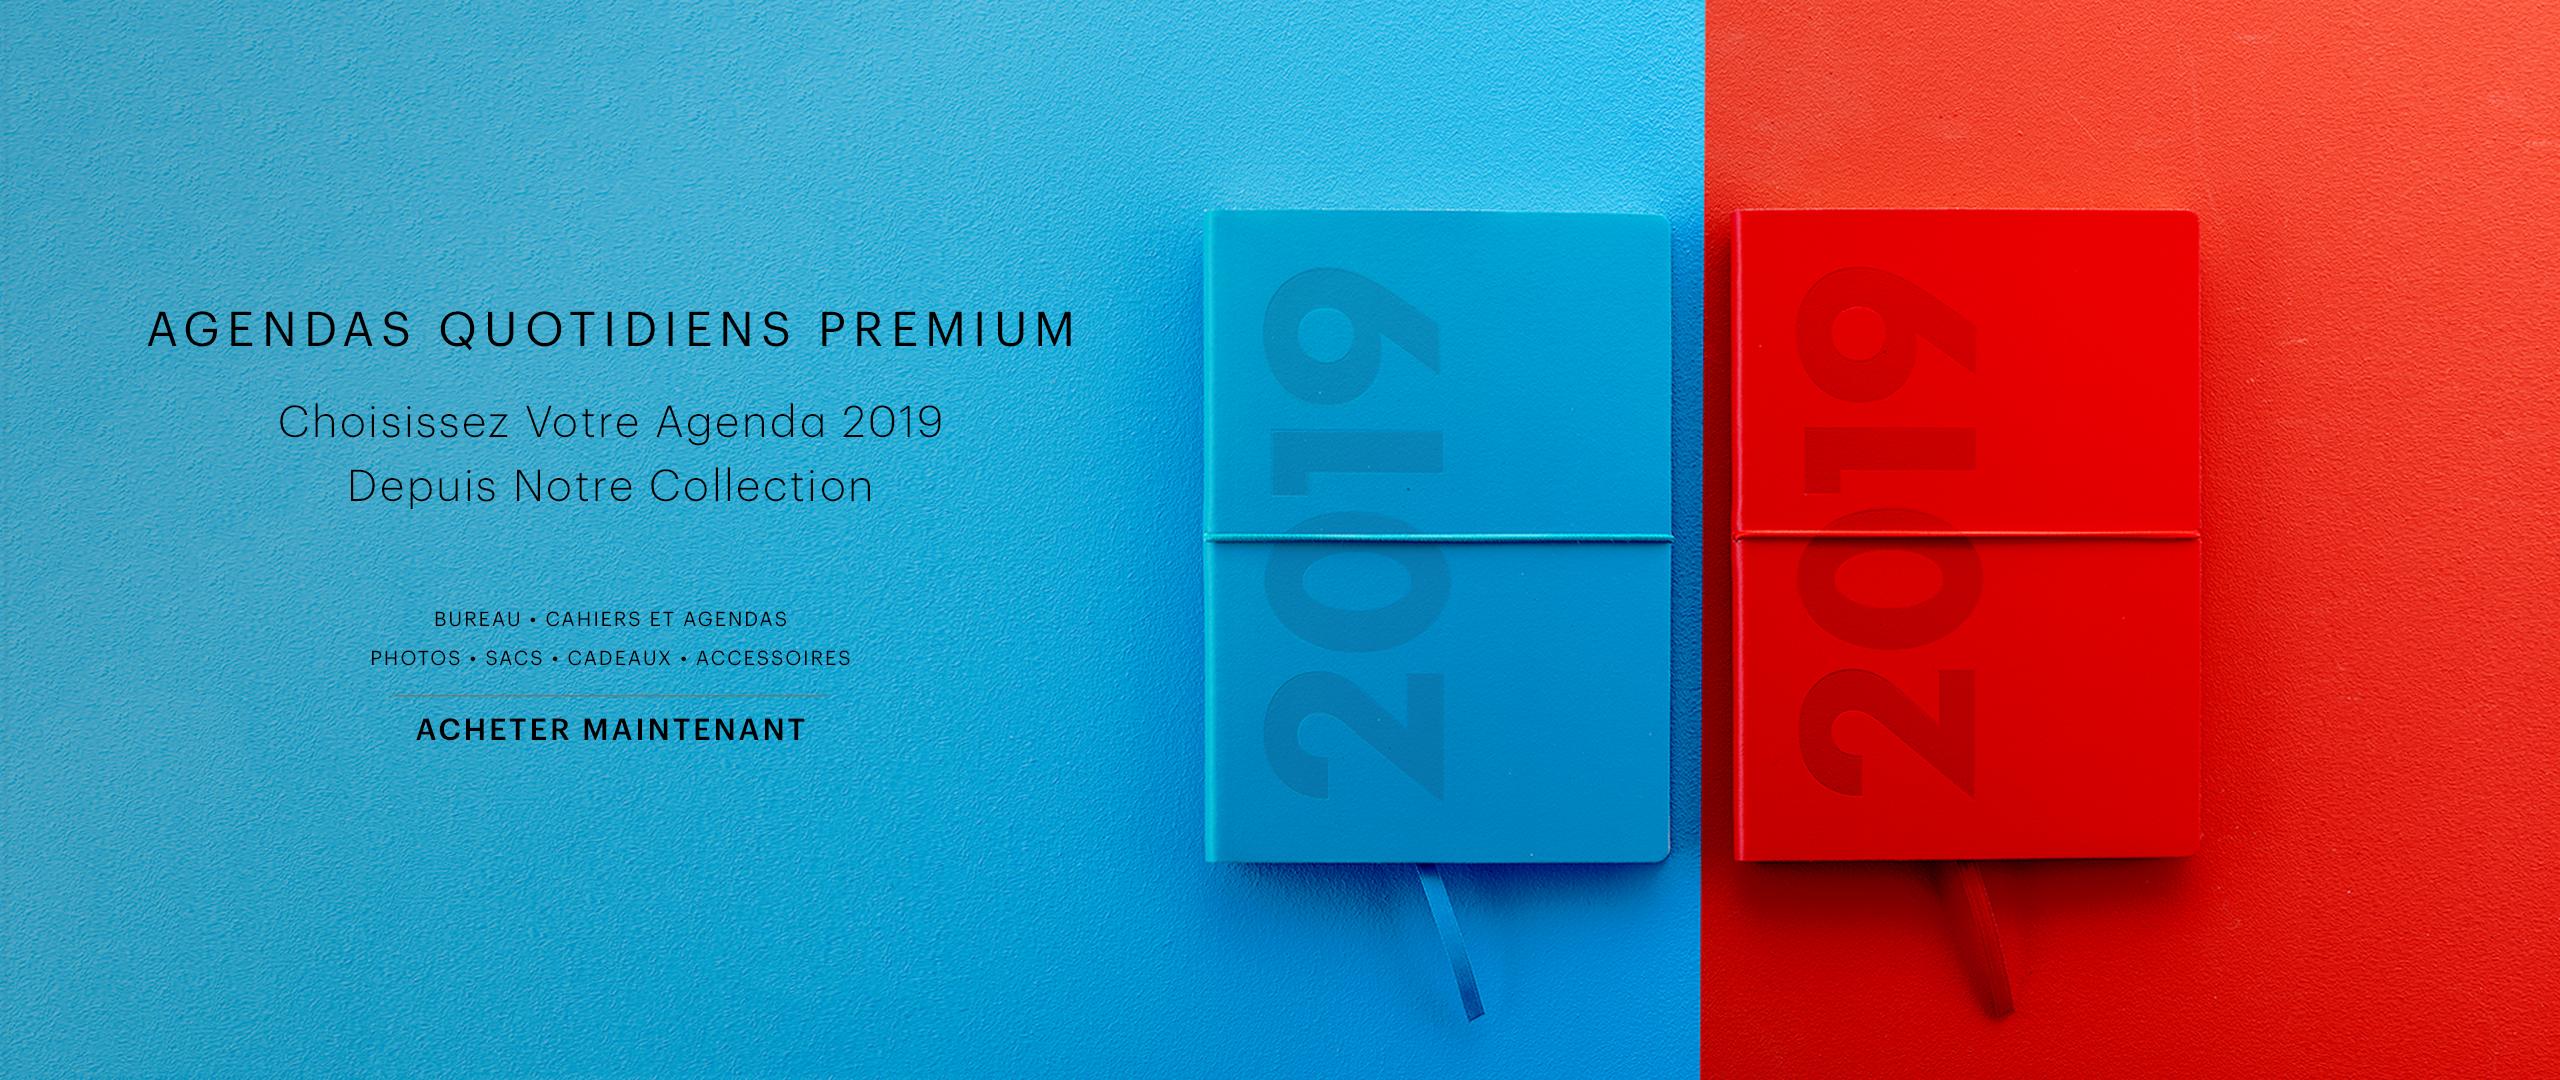 [OR] - BEU [FR] - Premium